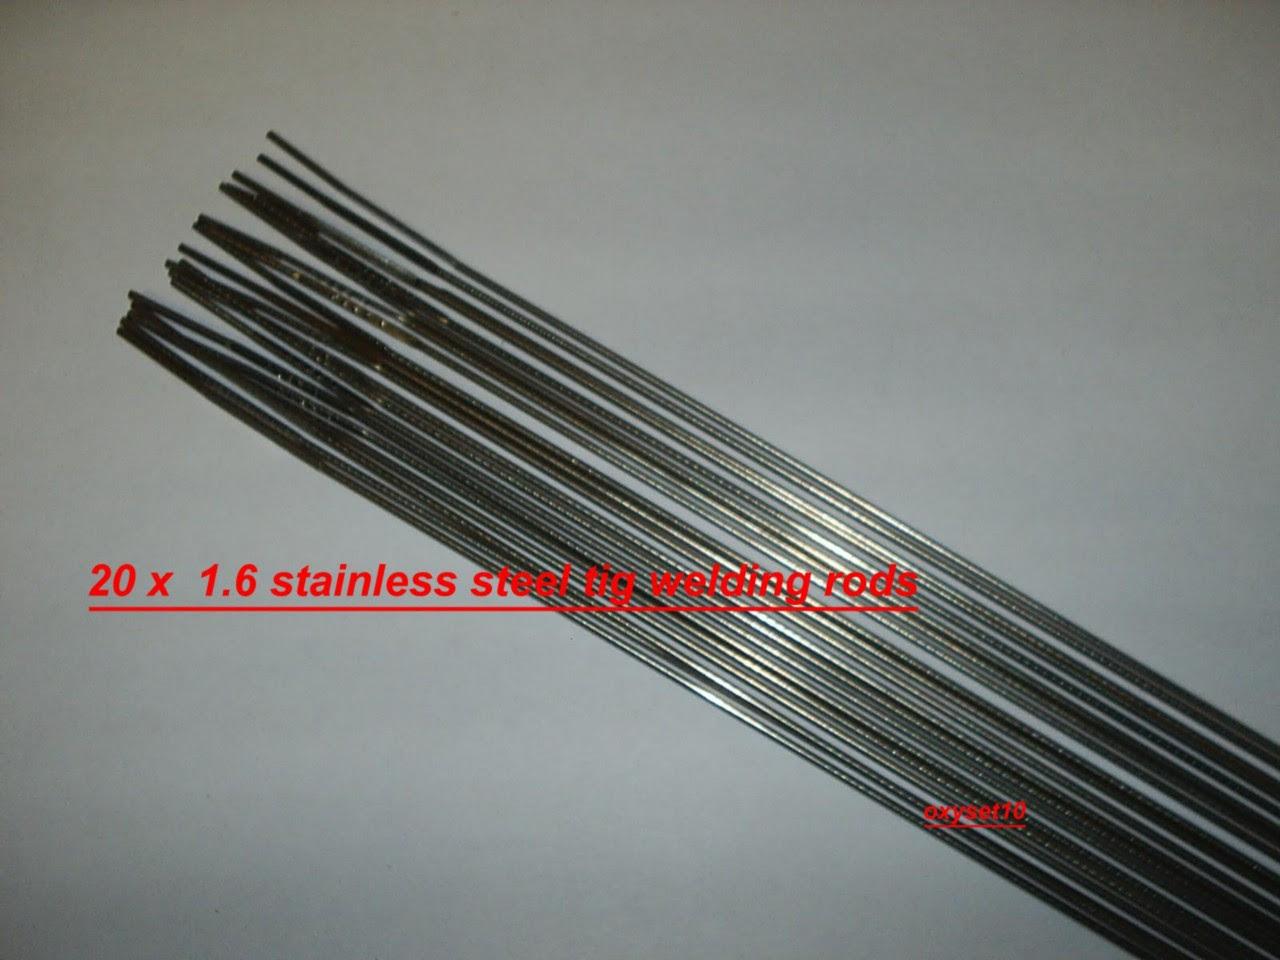 20 x 1.6mm stainless steel tig rod 308 grade | eBay